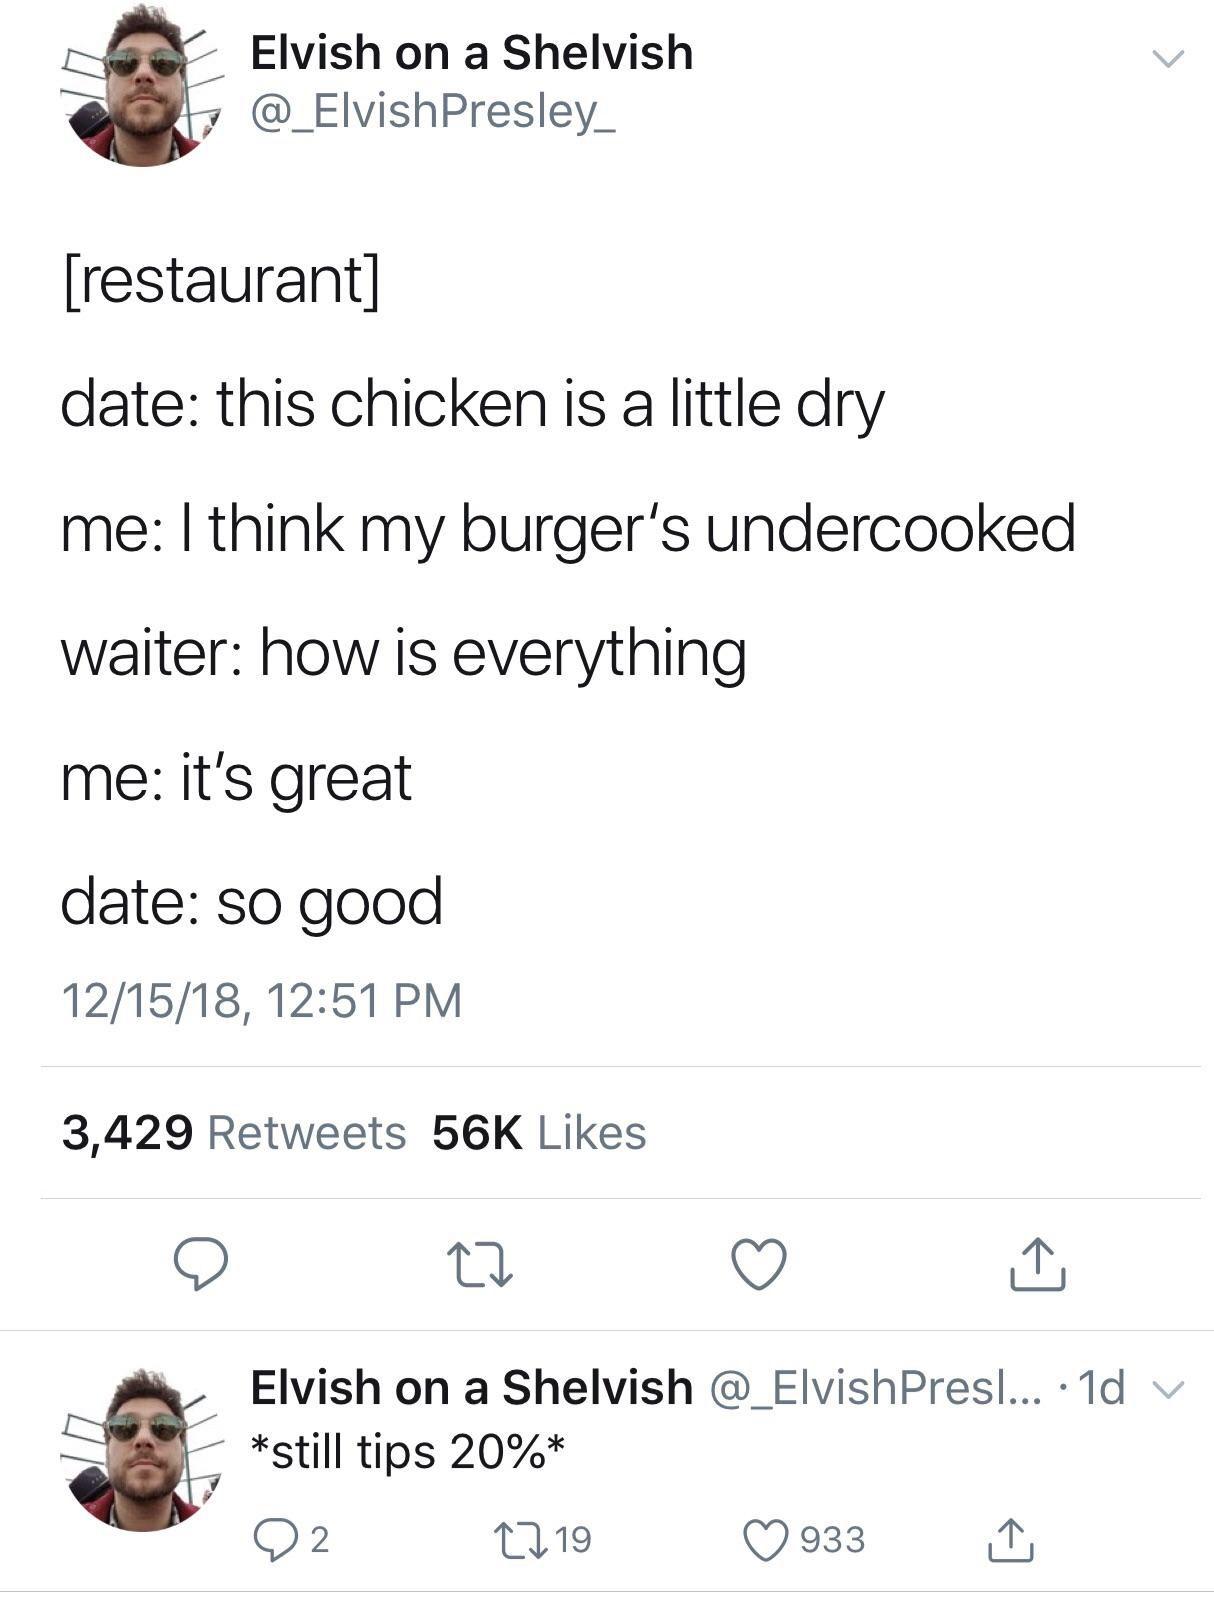 Lustige Dating-Beiträge